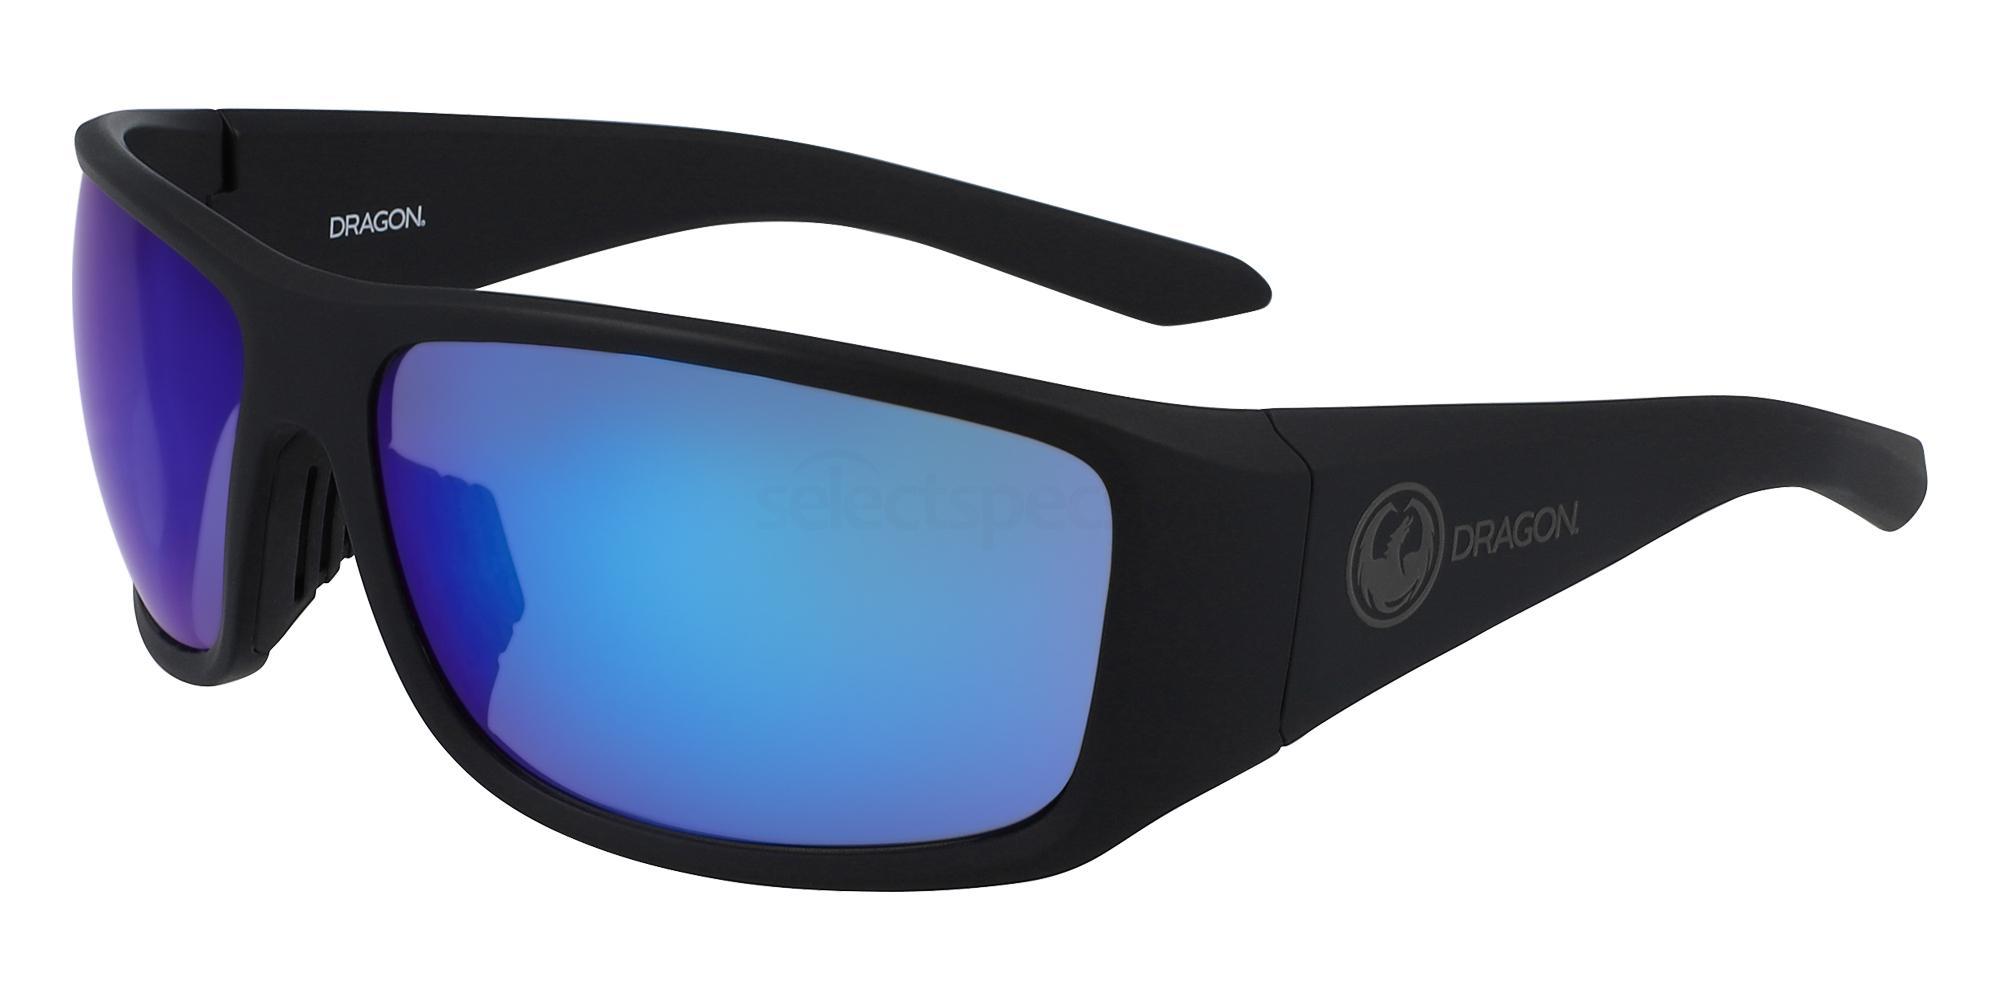 006 DR JUMP LL ION Sunglasses, Dragon